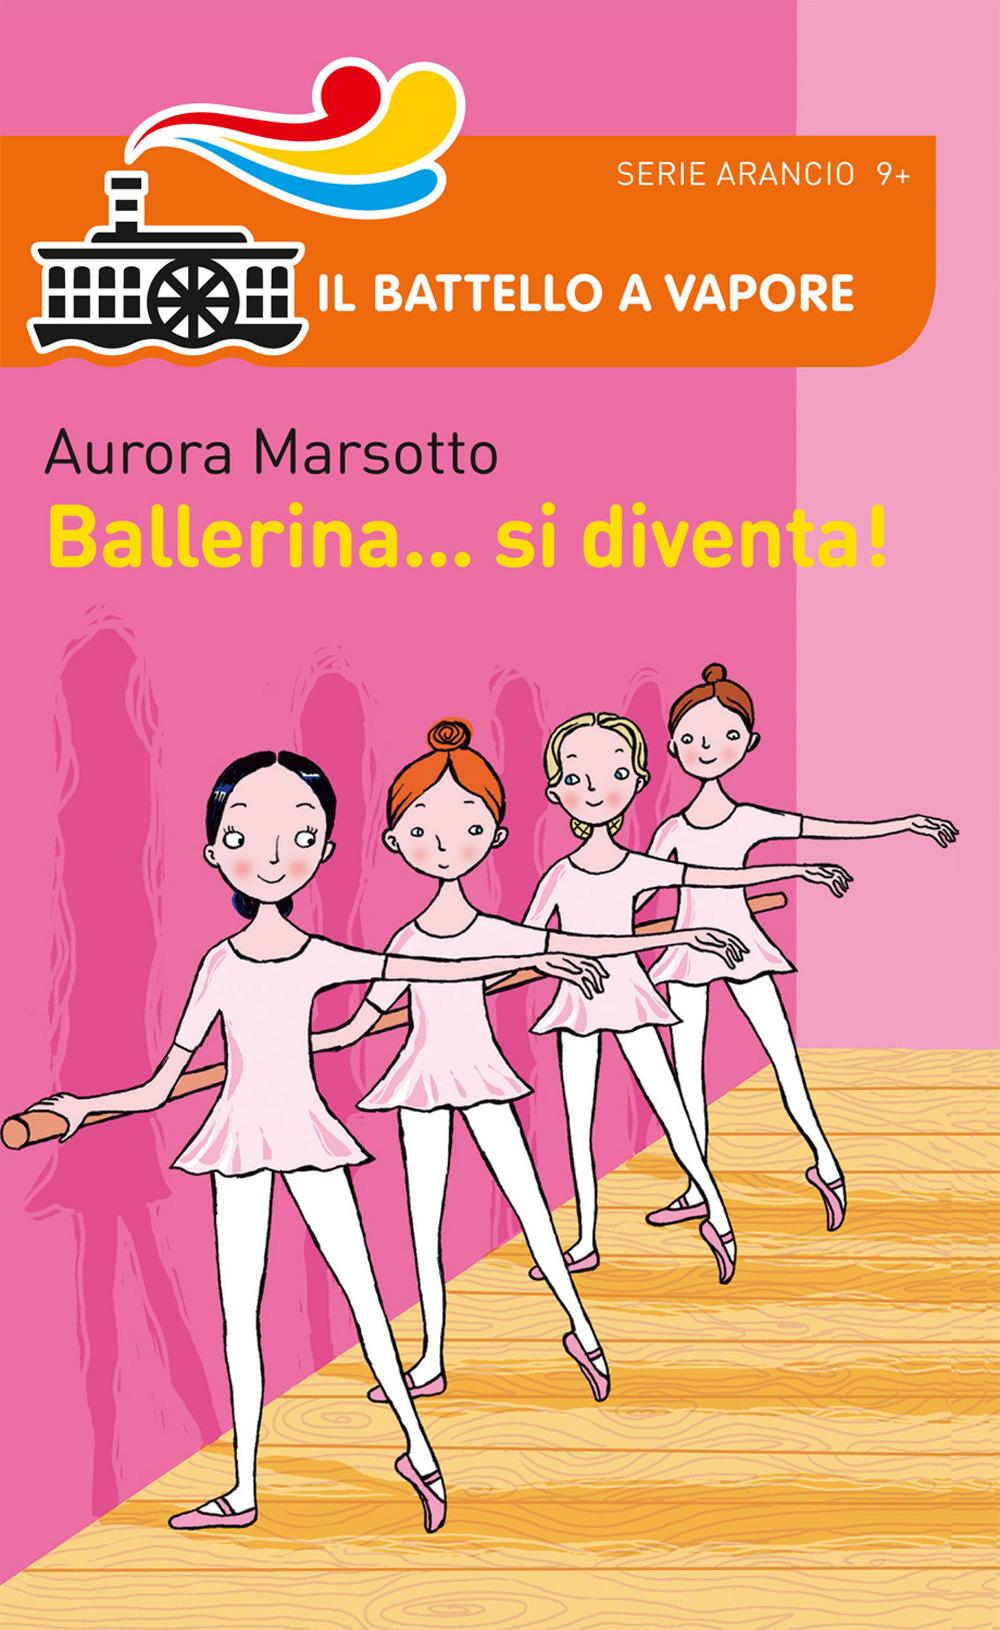 Image of Ballerina... si diventa!